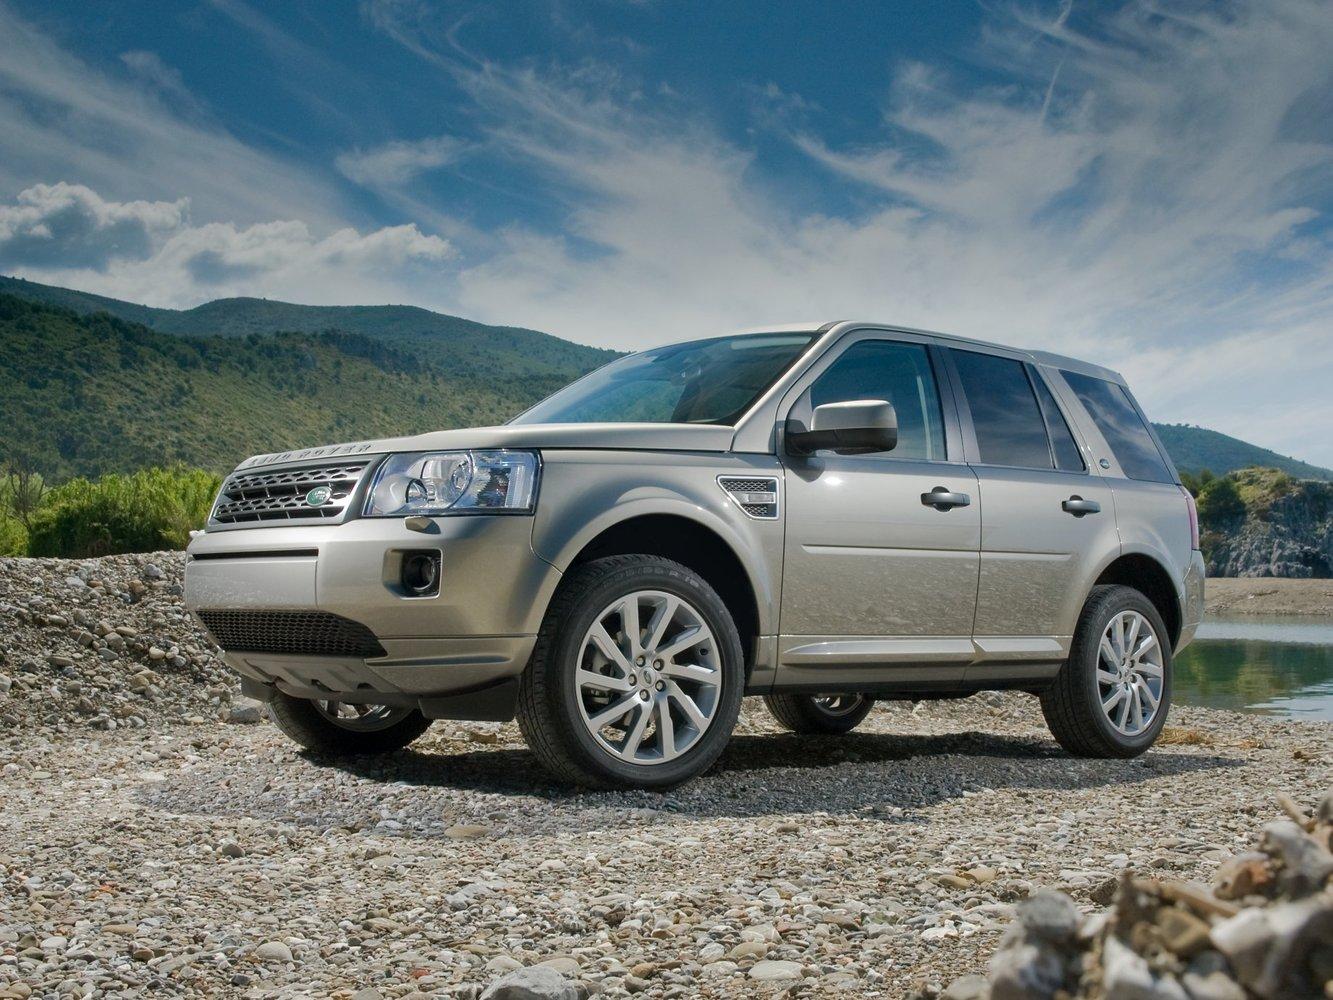 land_rover Land Rover Freelander